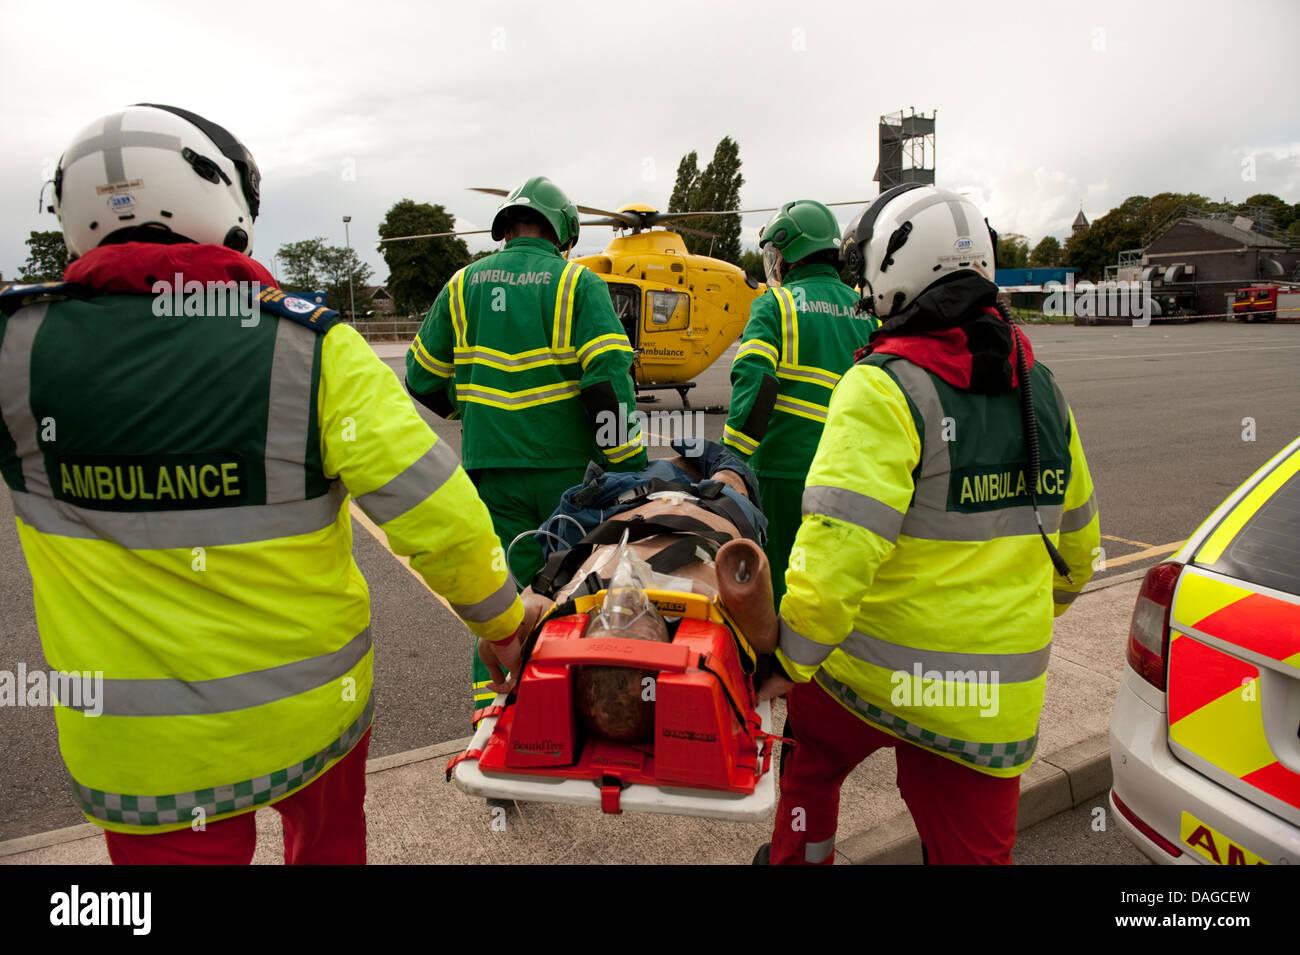 Paramedic Ambulance stretcher neck injury reconstruction - Stock Image